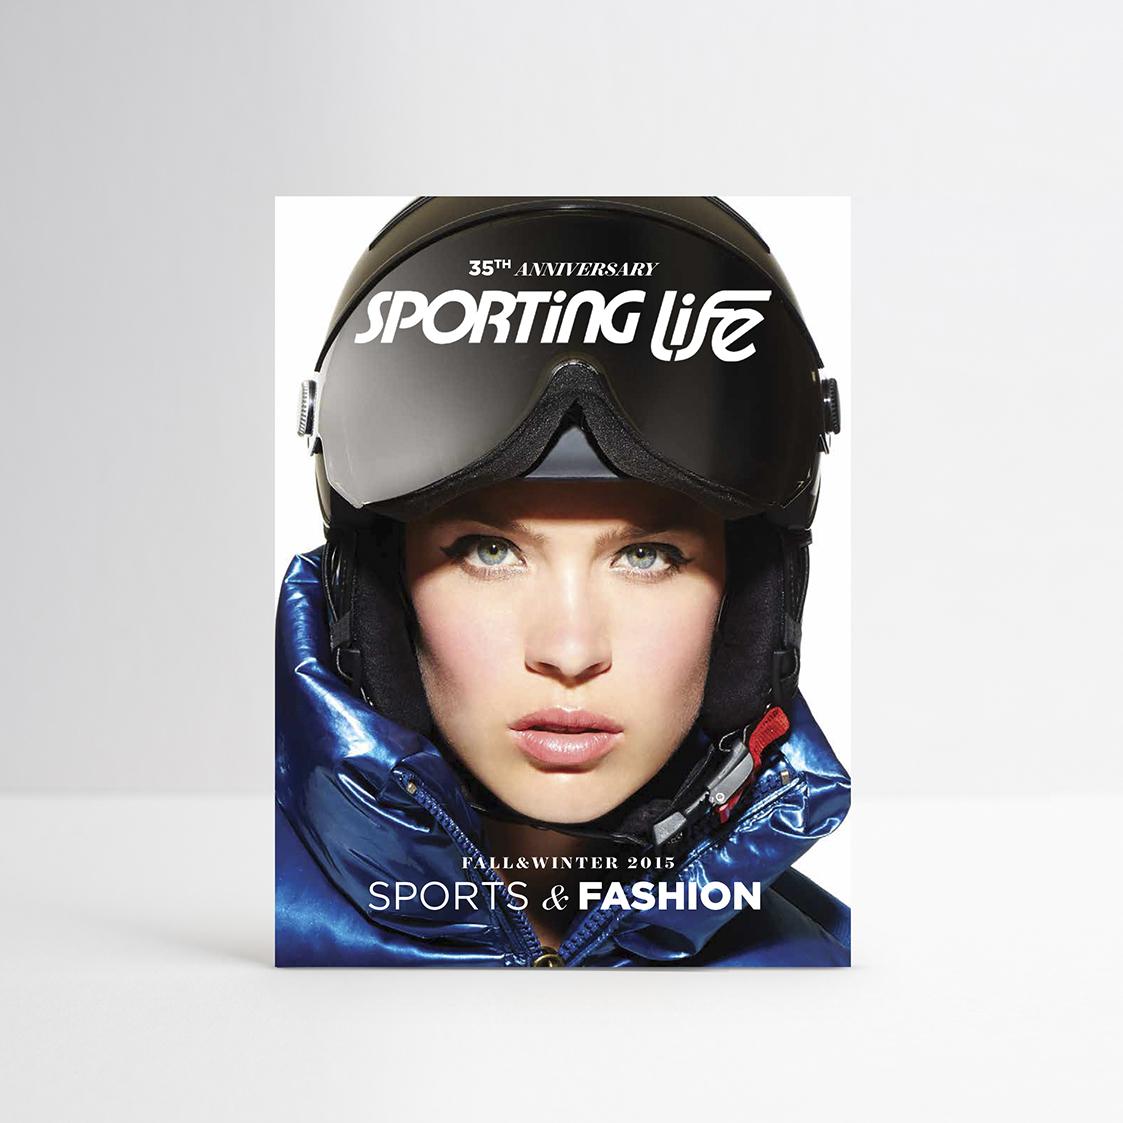 Sporting Life Fall/Winter 2015 Magazine